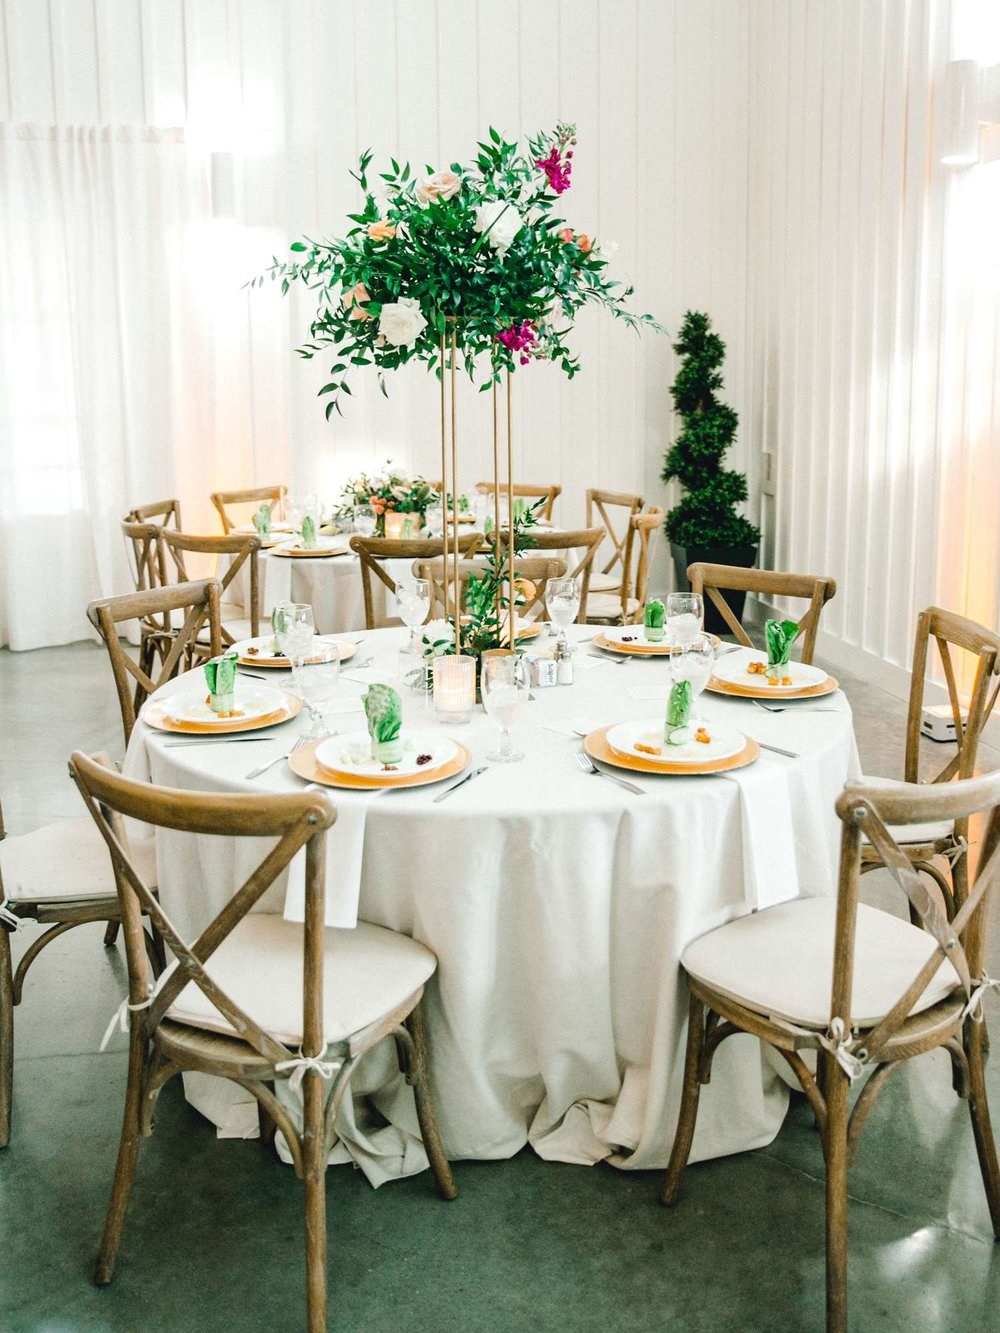 HEBERT_MORGAN_AND_CLAY_ALLEEJ_THE_FARMHOUSE_MONTGOMERY_TEXAS_WEDDING_0159.jpg